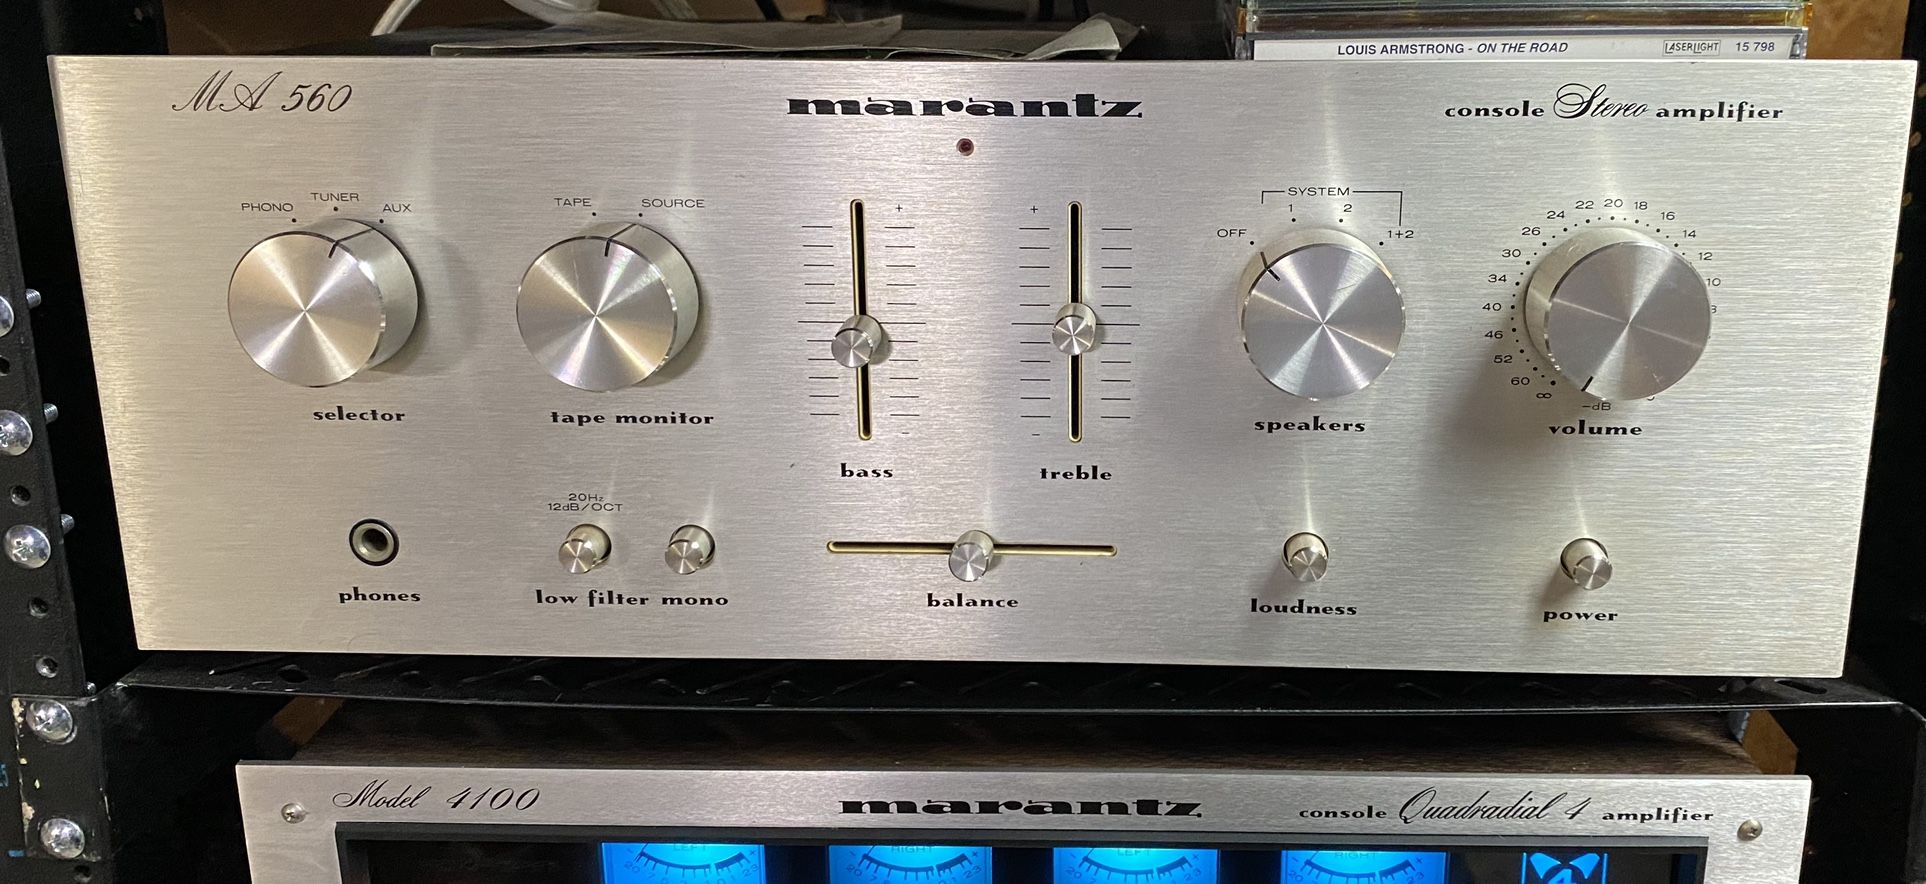 Marantz MA560 Stereo Amplifier